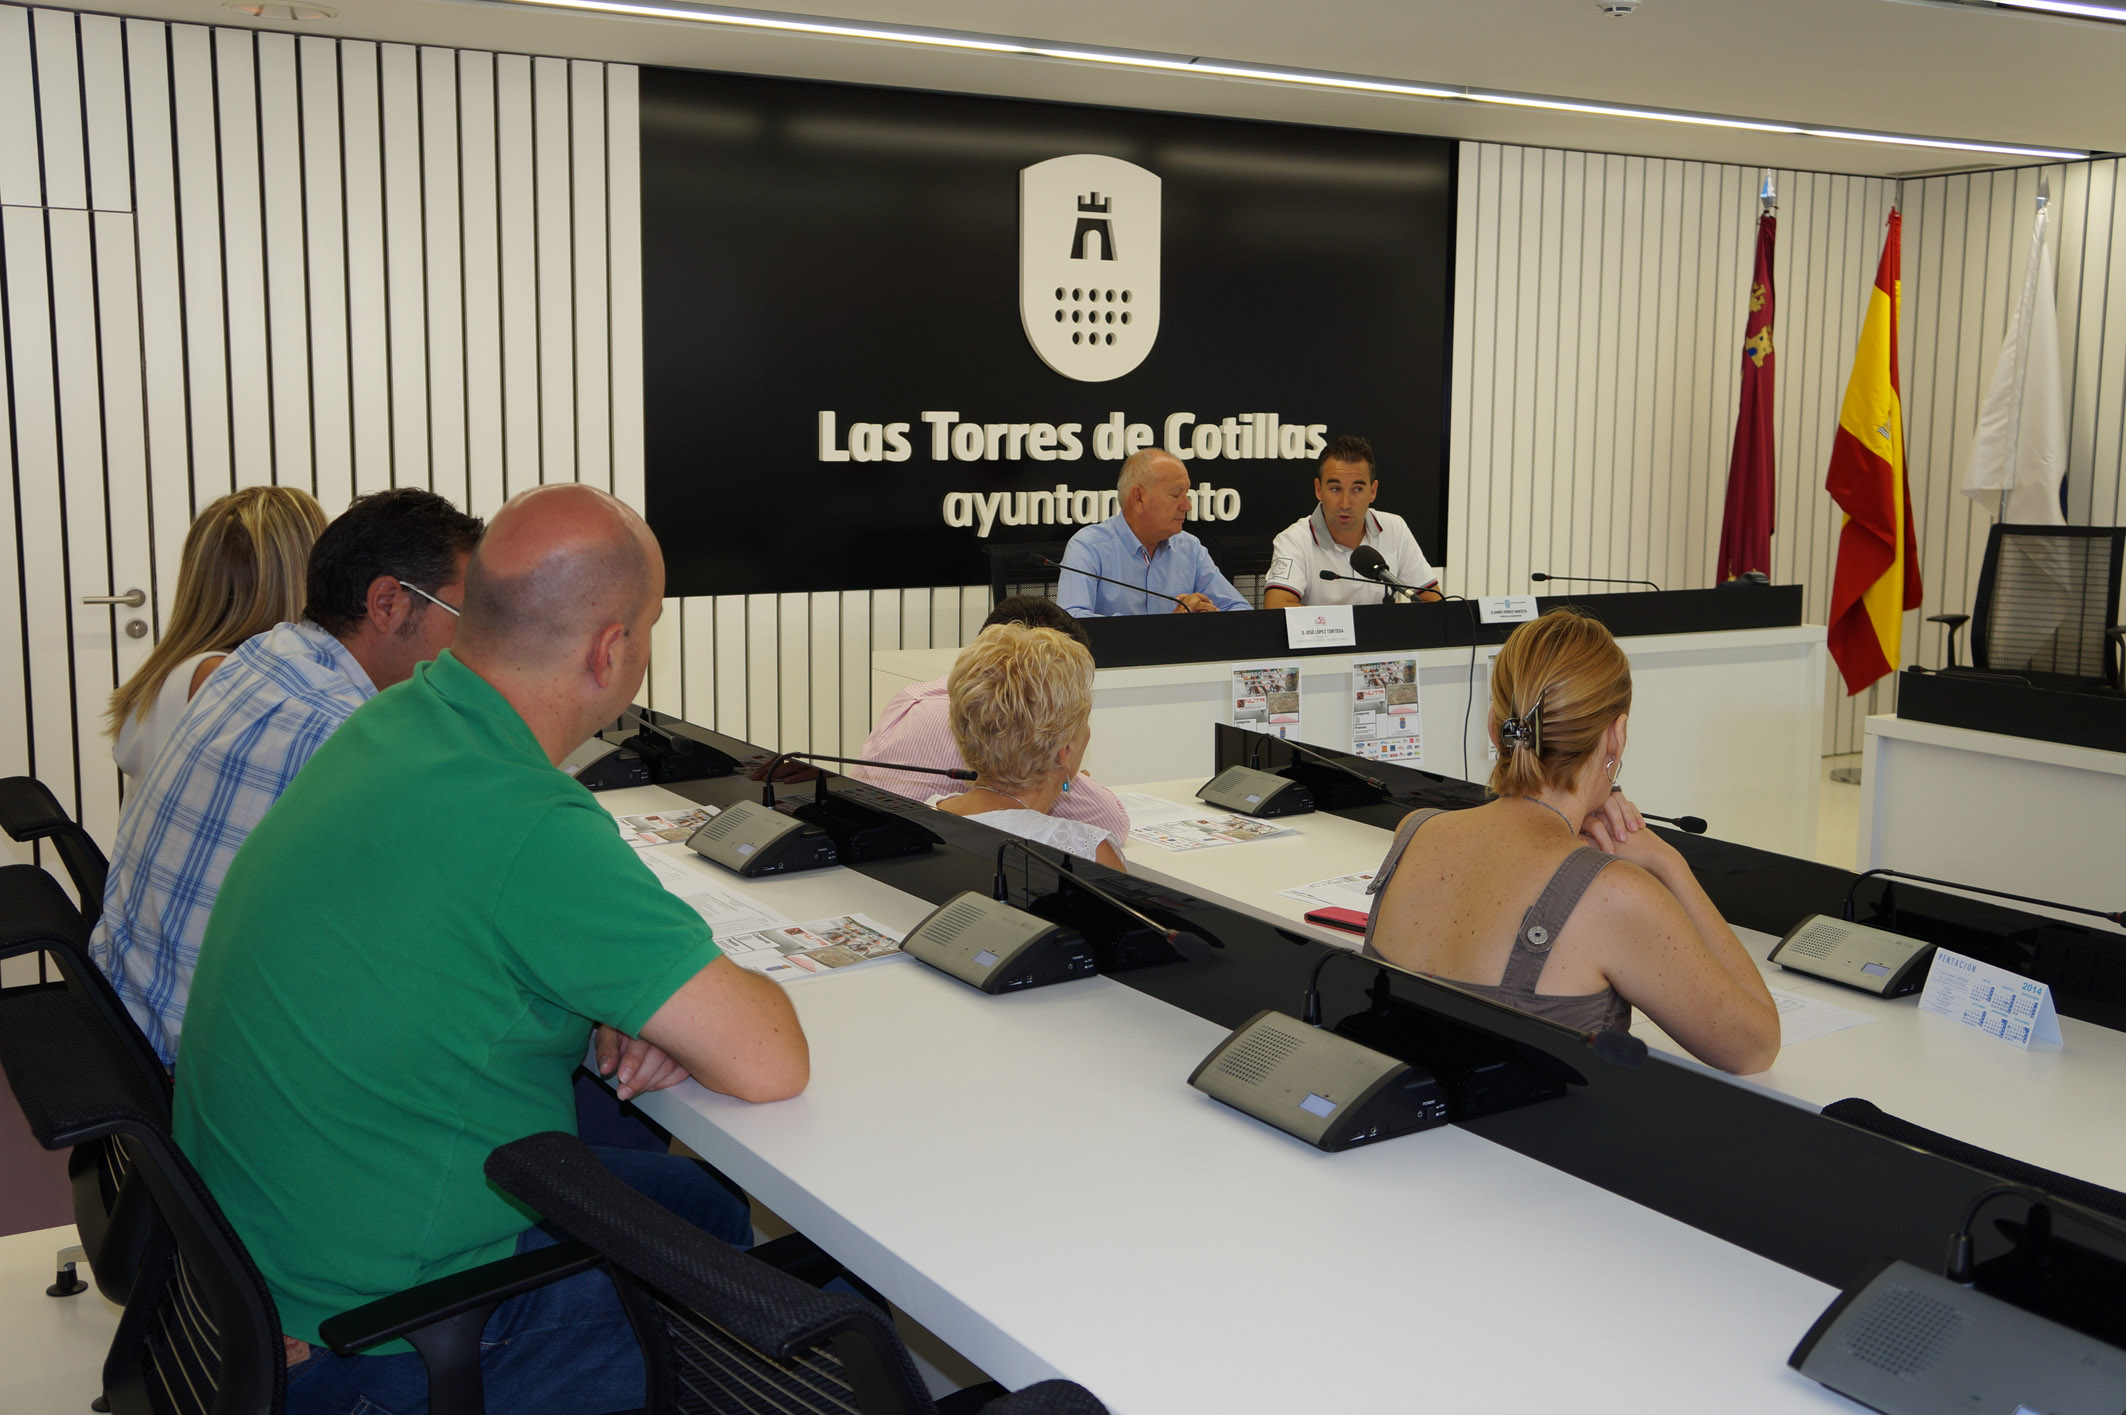 discreto sitio de citas salida cerca de Murcia